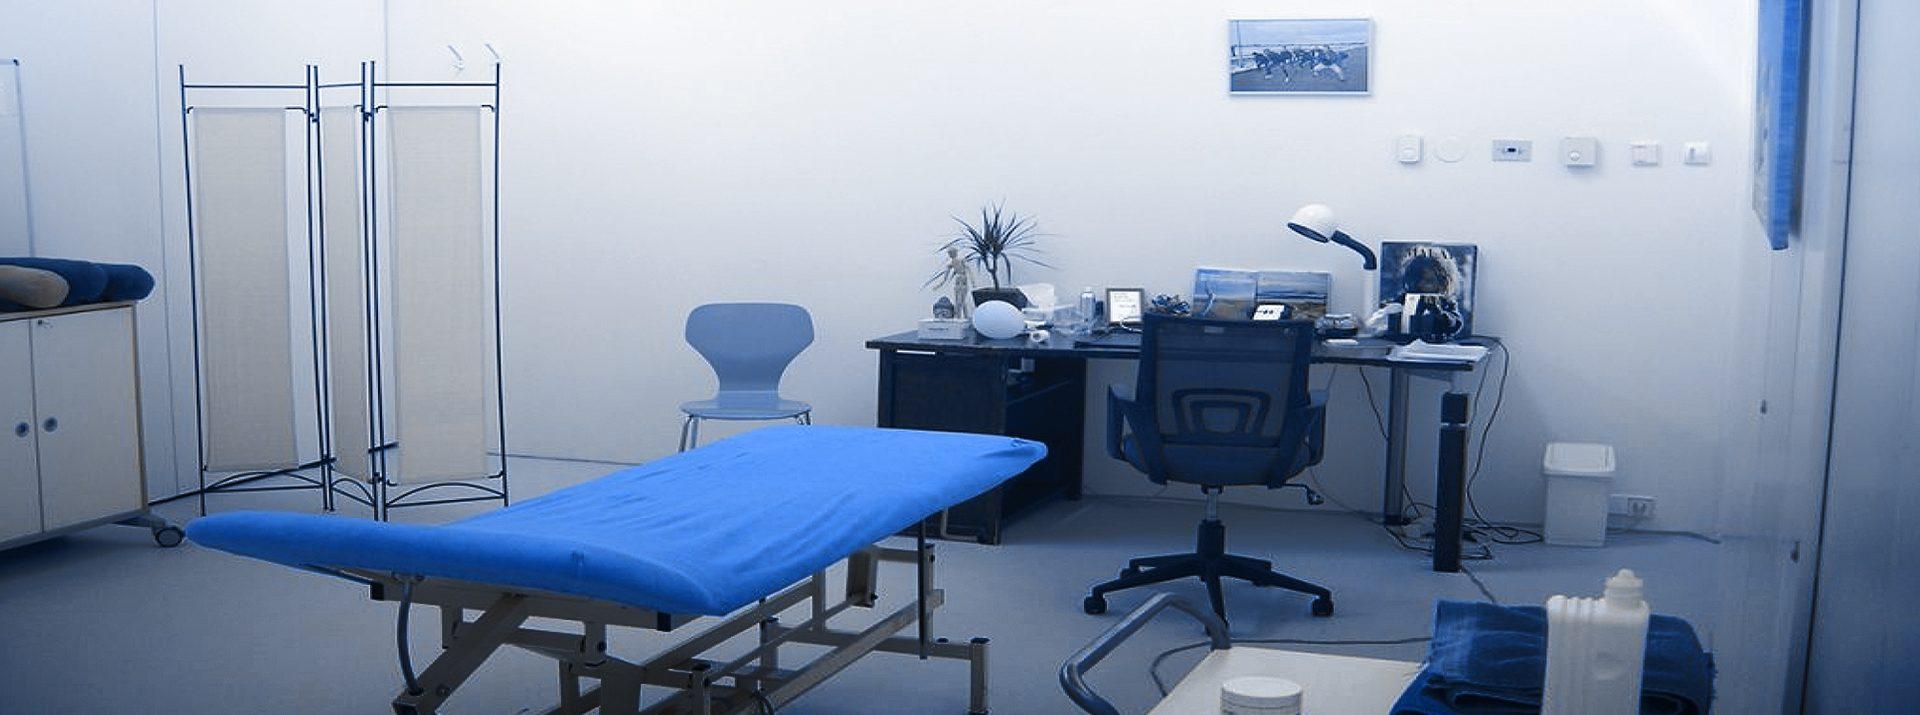 Fysiotherapie Osdorp